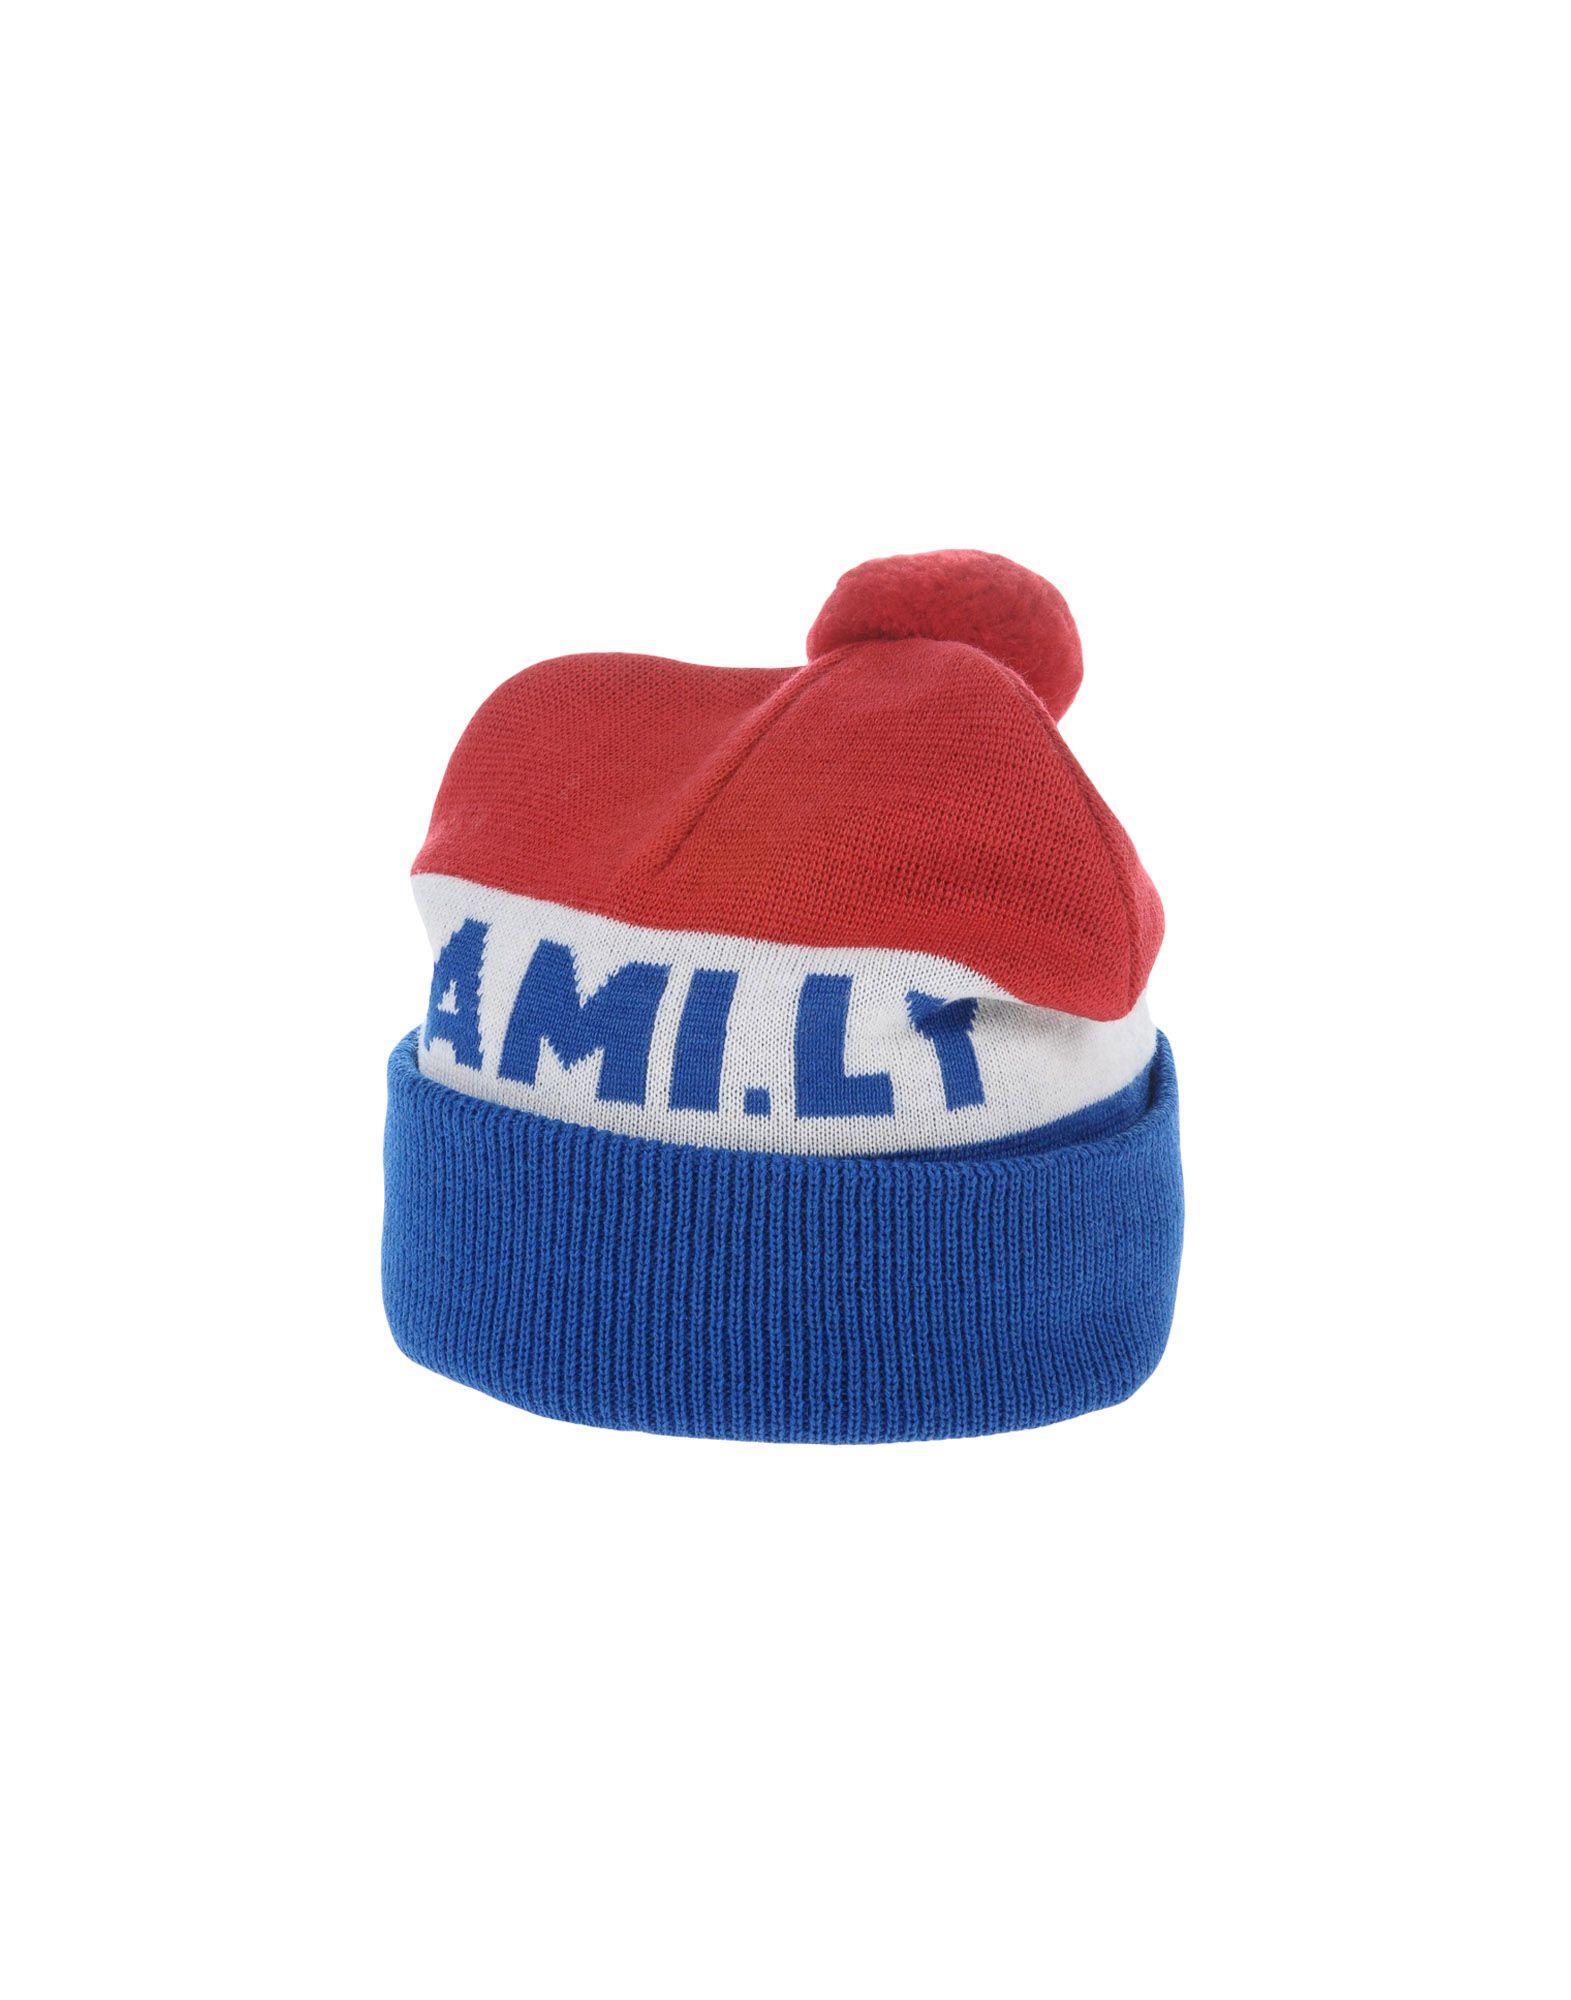 9ae50d9a4f1 Ami Alexandre Mattiussi Hats In Red